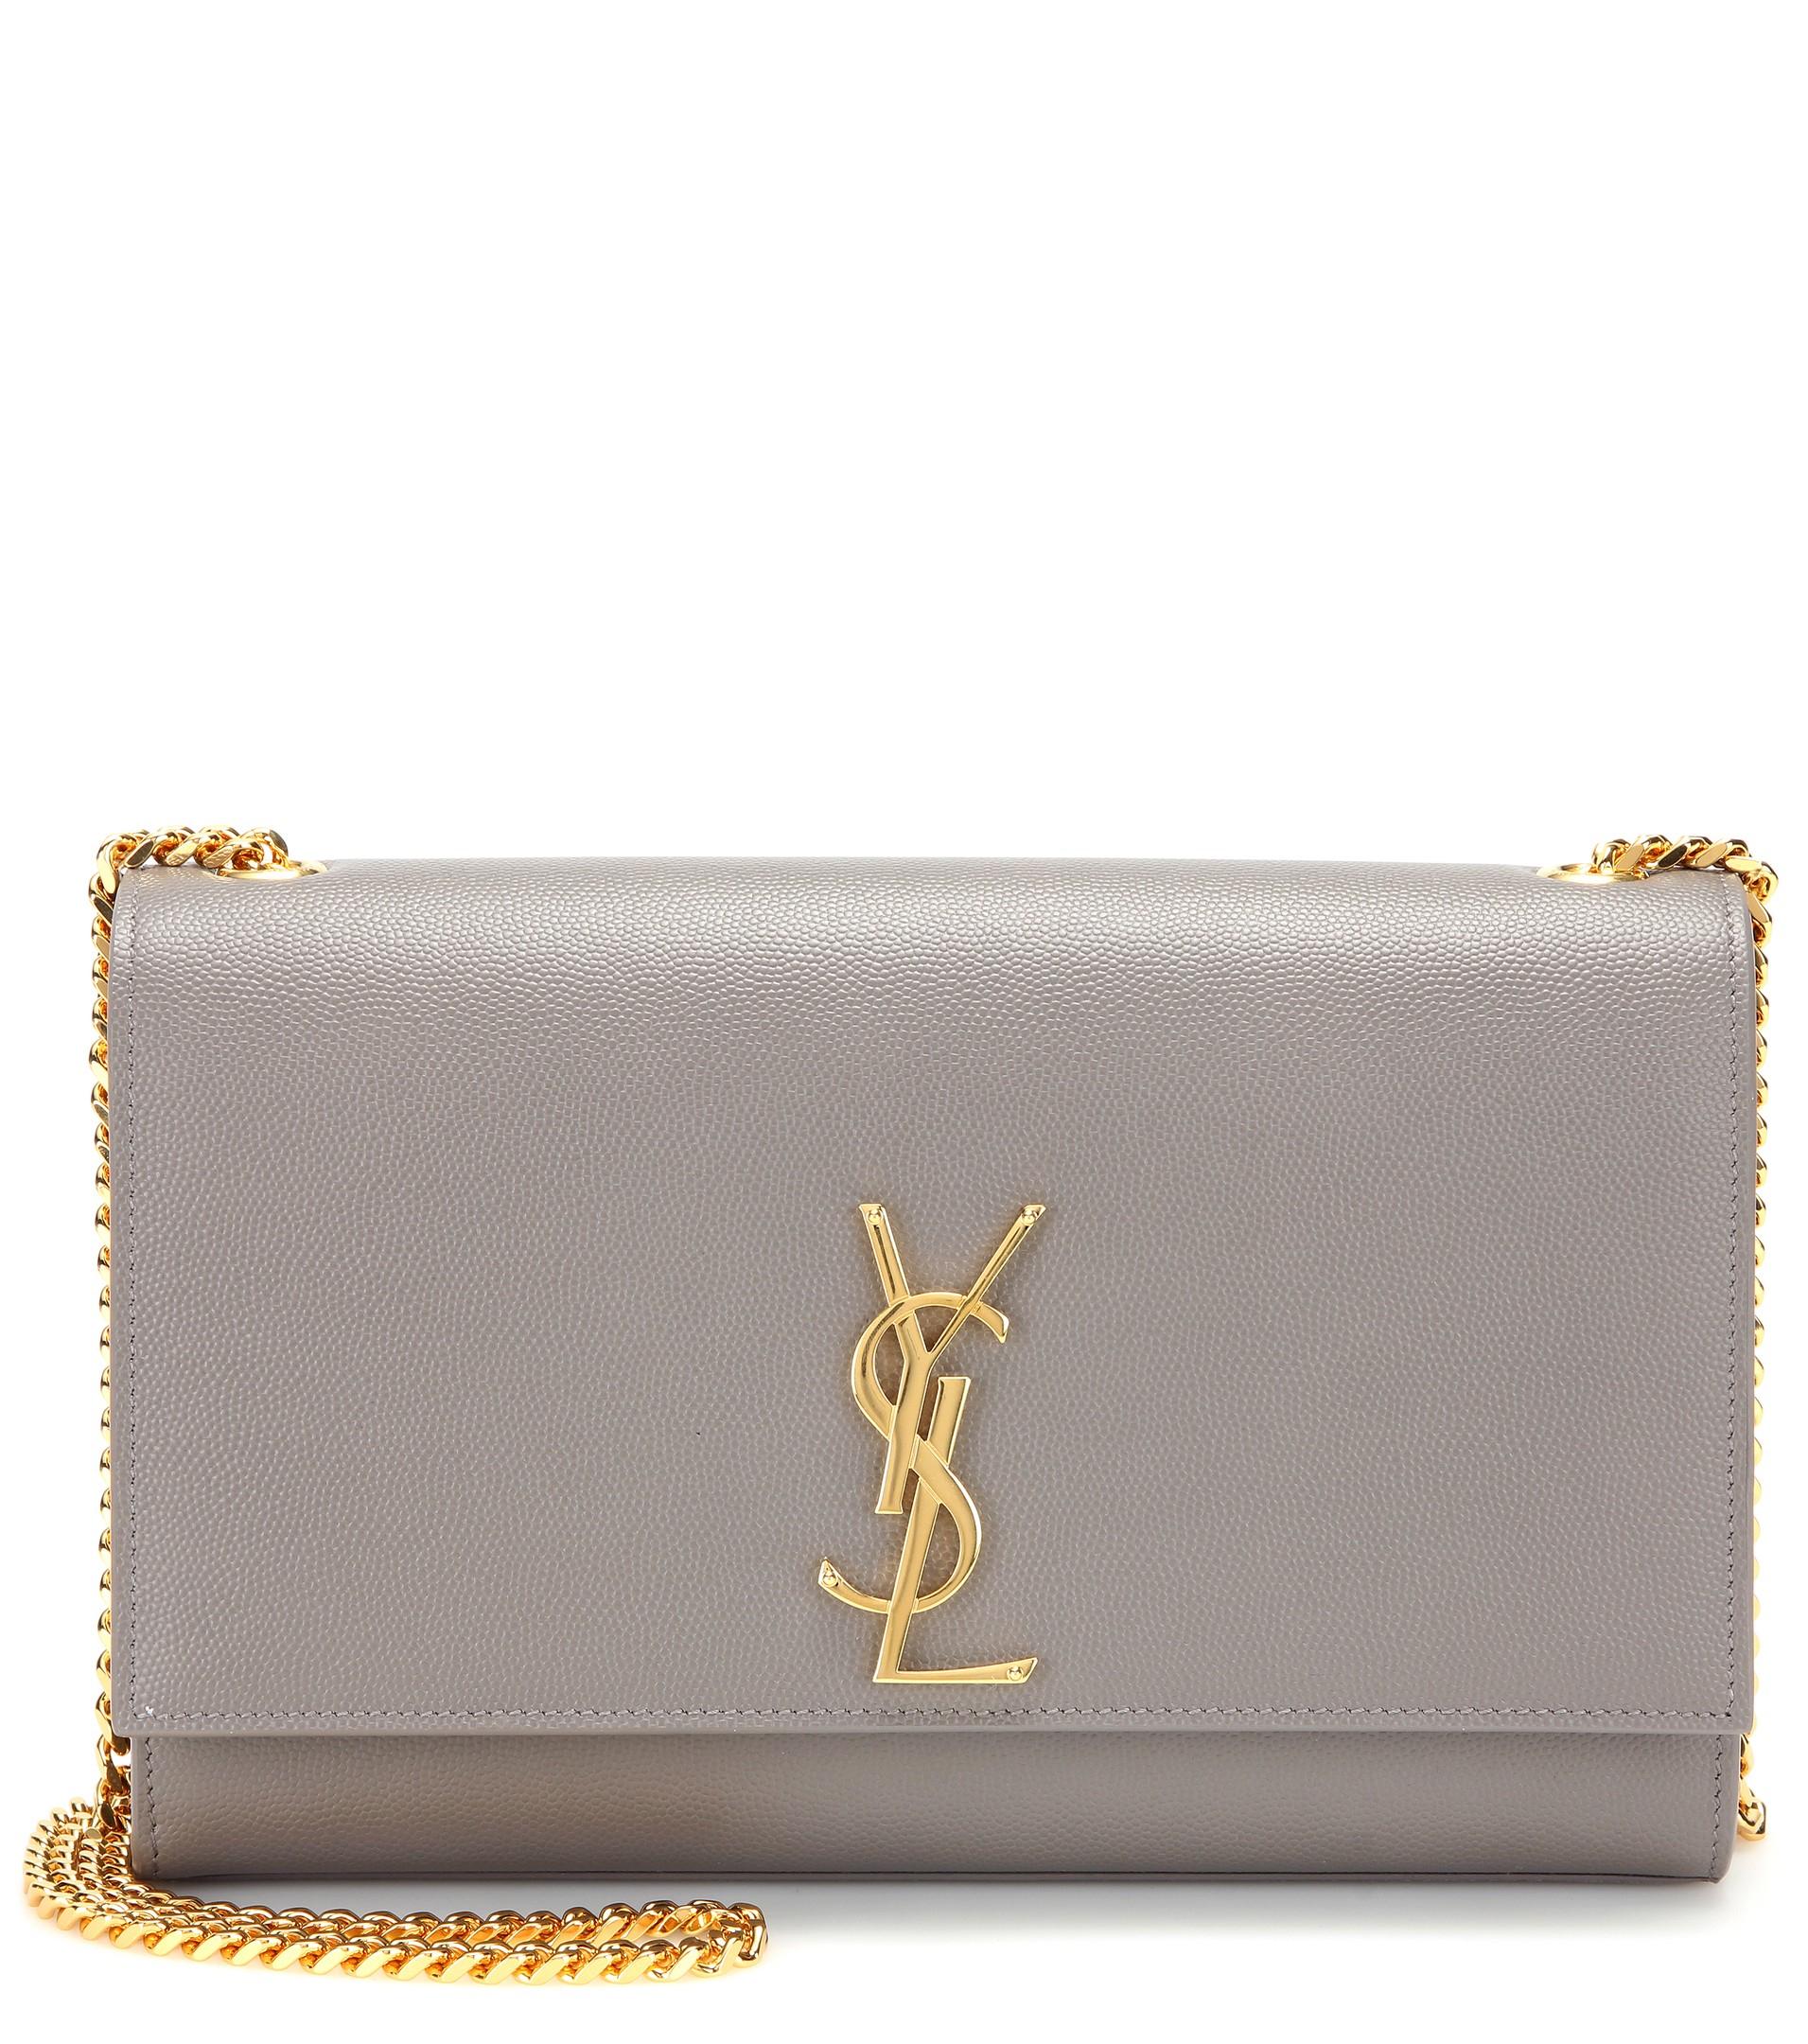 ae95e46aa676c ysl rive gauche bag - classic large monogram saint laurent college bag in  light grey .